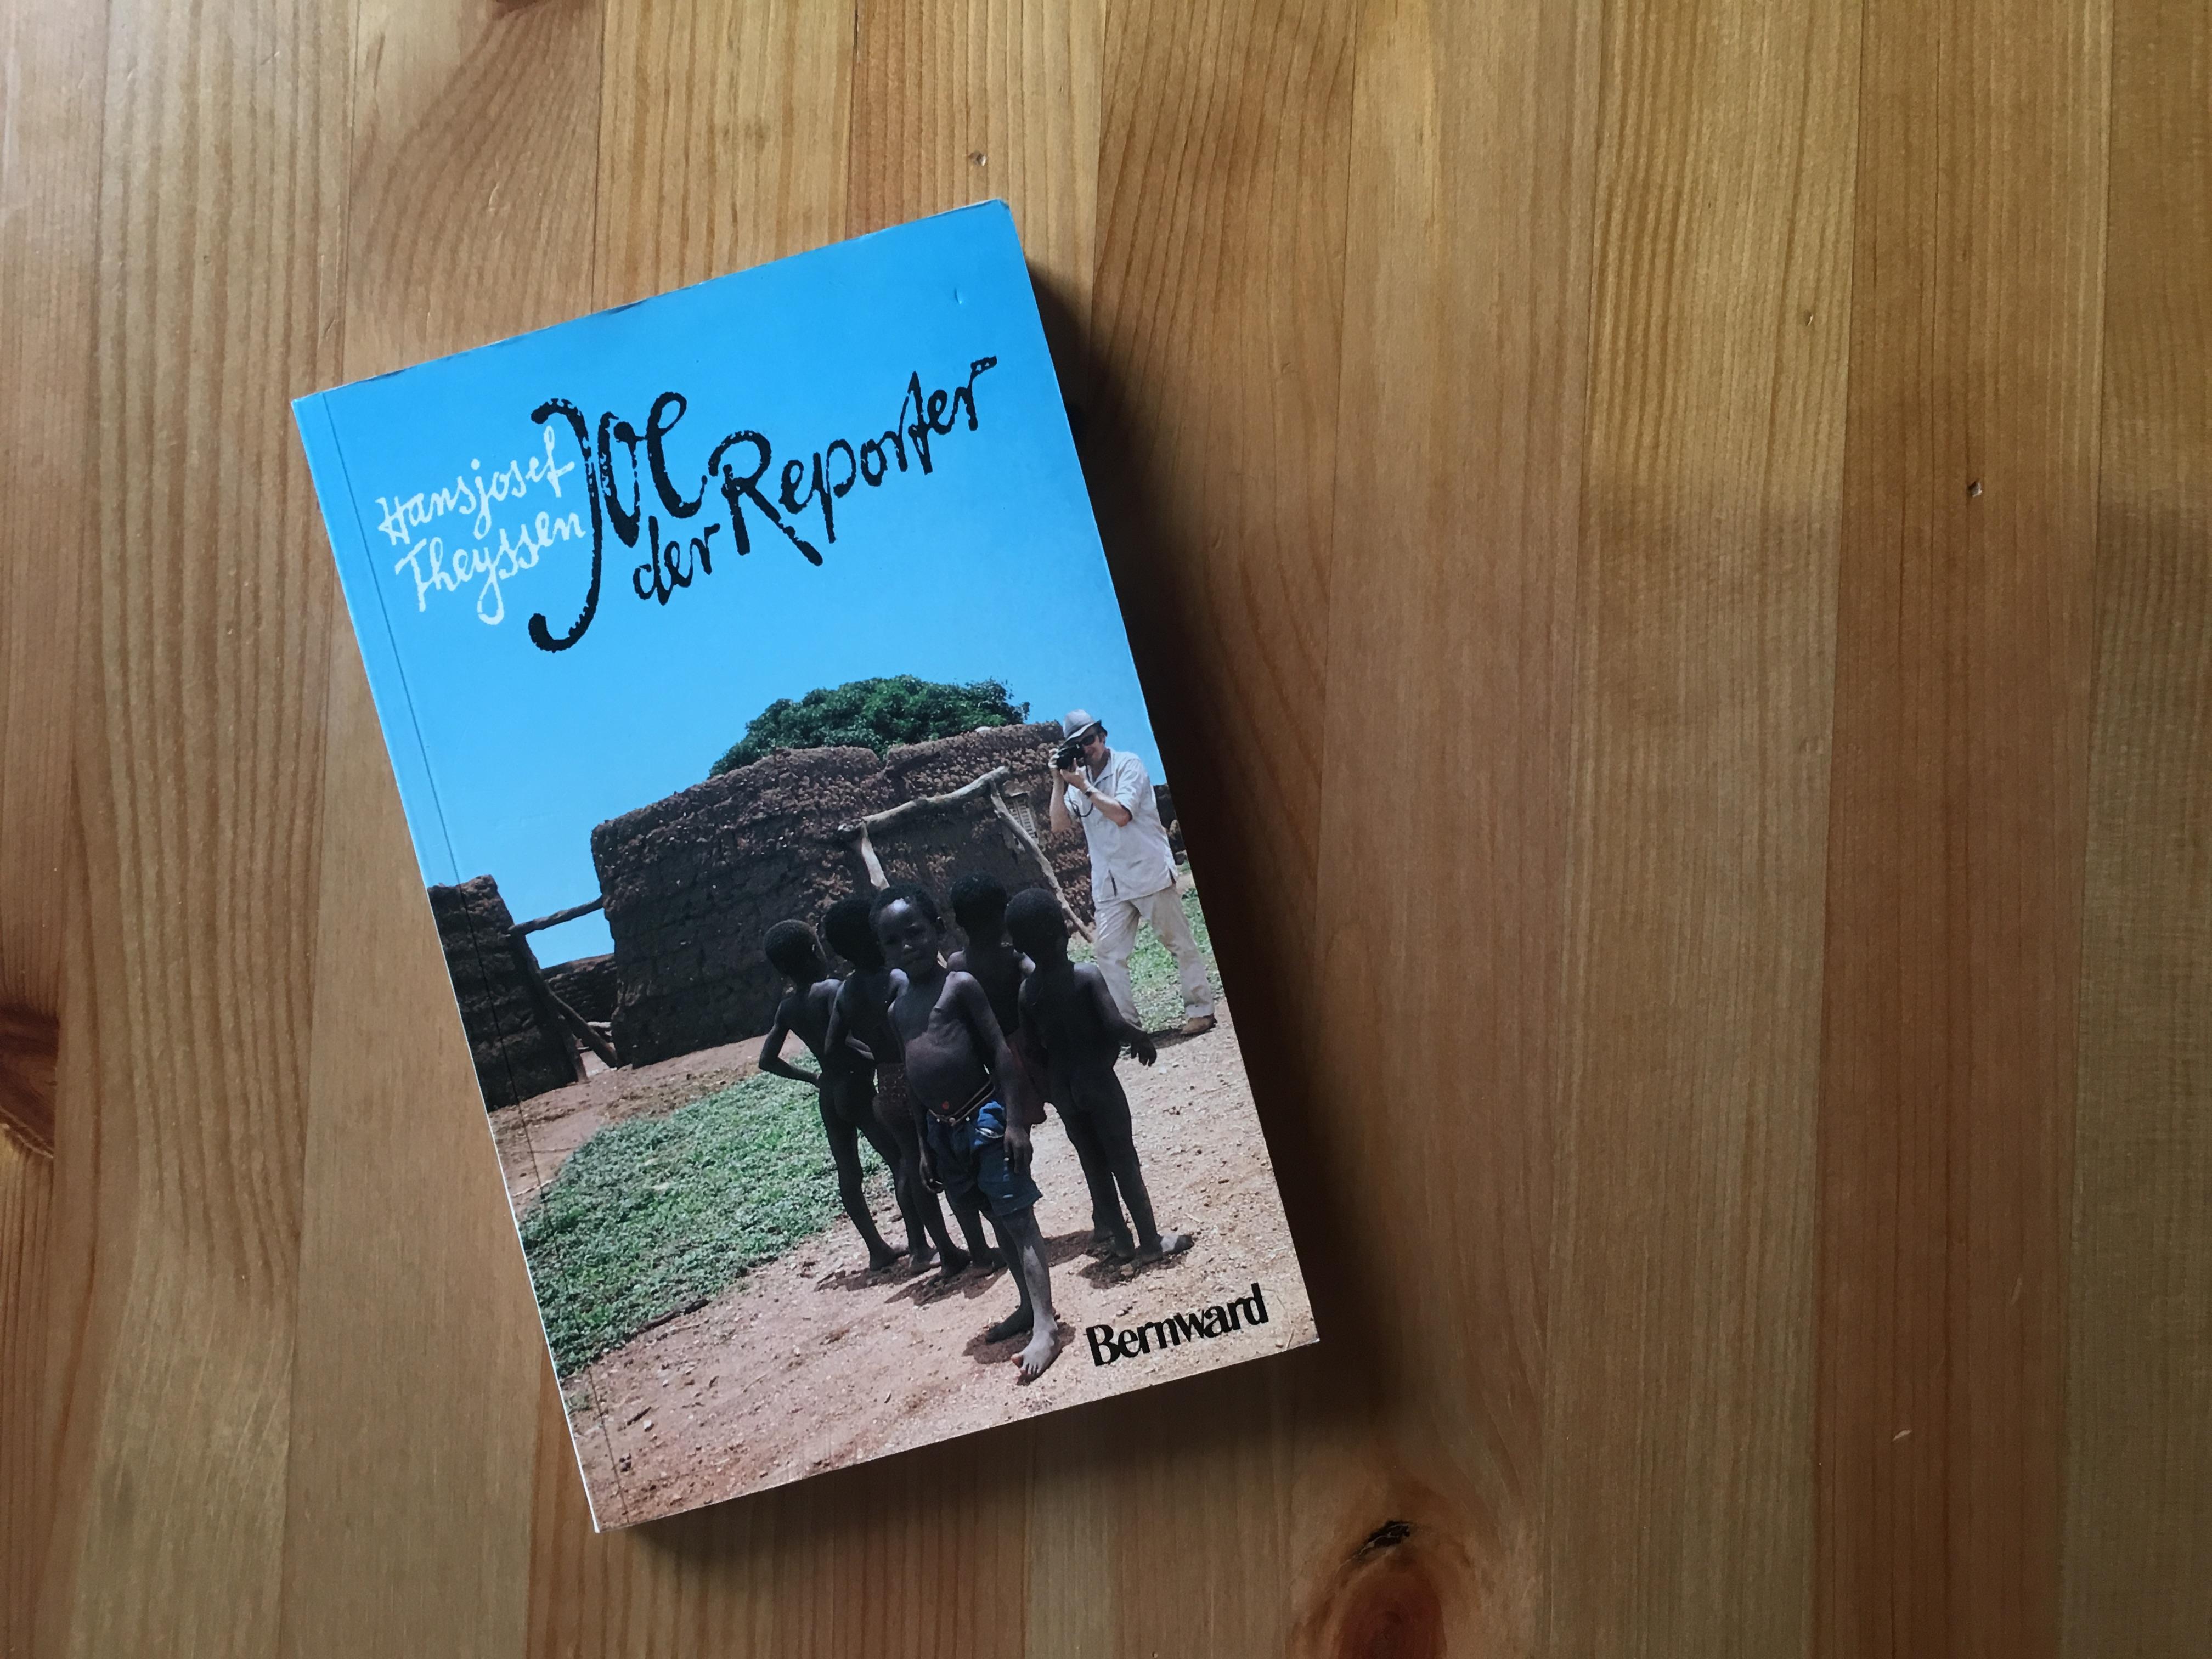 Joe, der Reporter - Buchcover - Hansjosef Theyssen